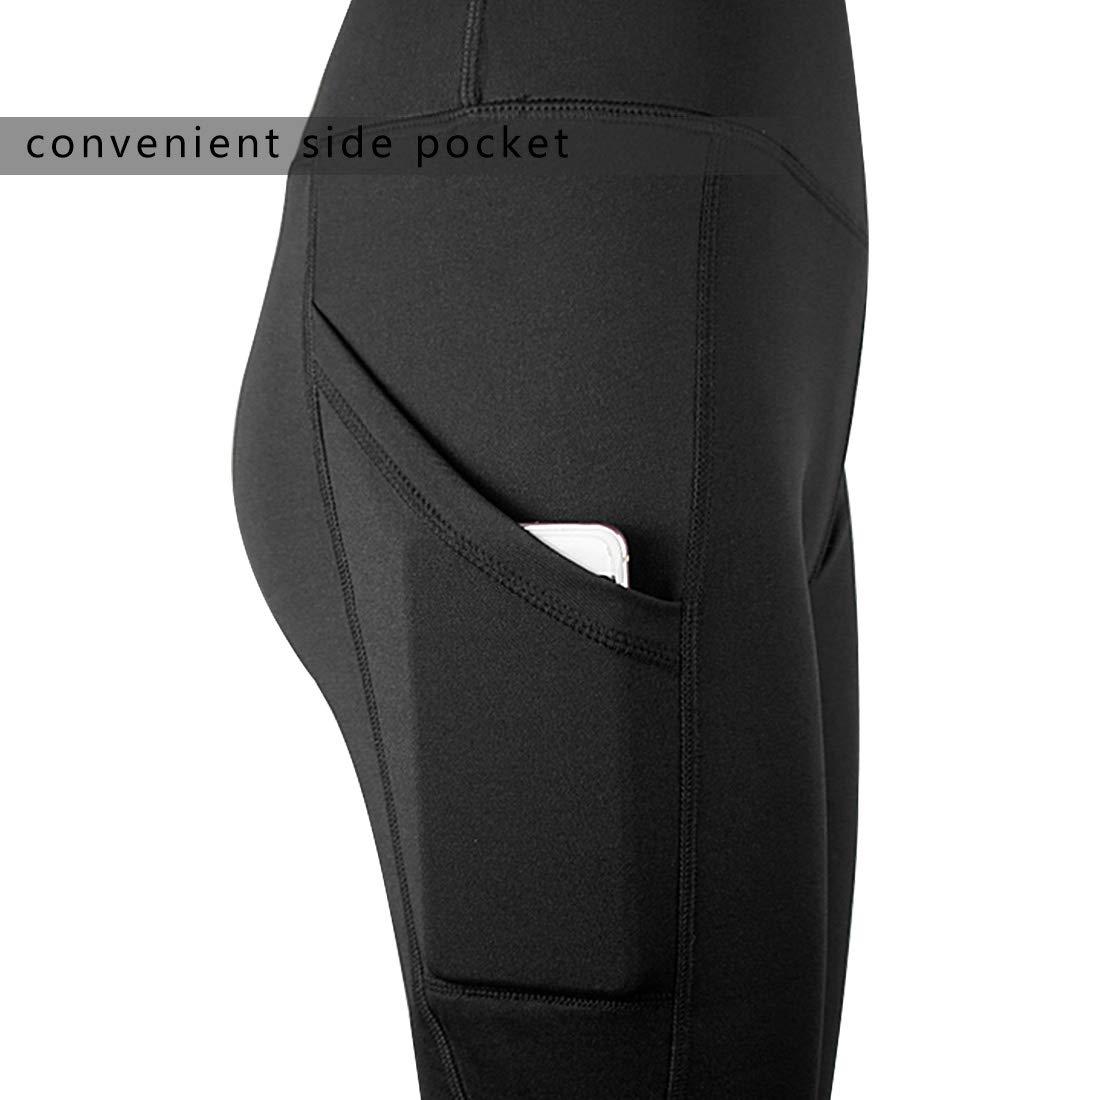 La Dearchuu Yoga Pants for Women High Waist Workout Ladies Leggings for Sports